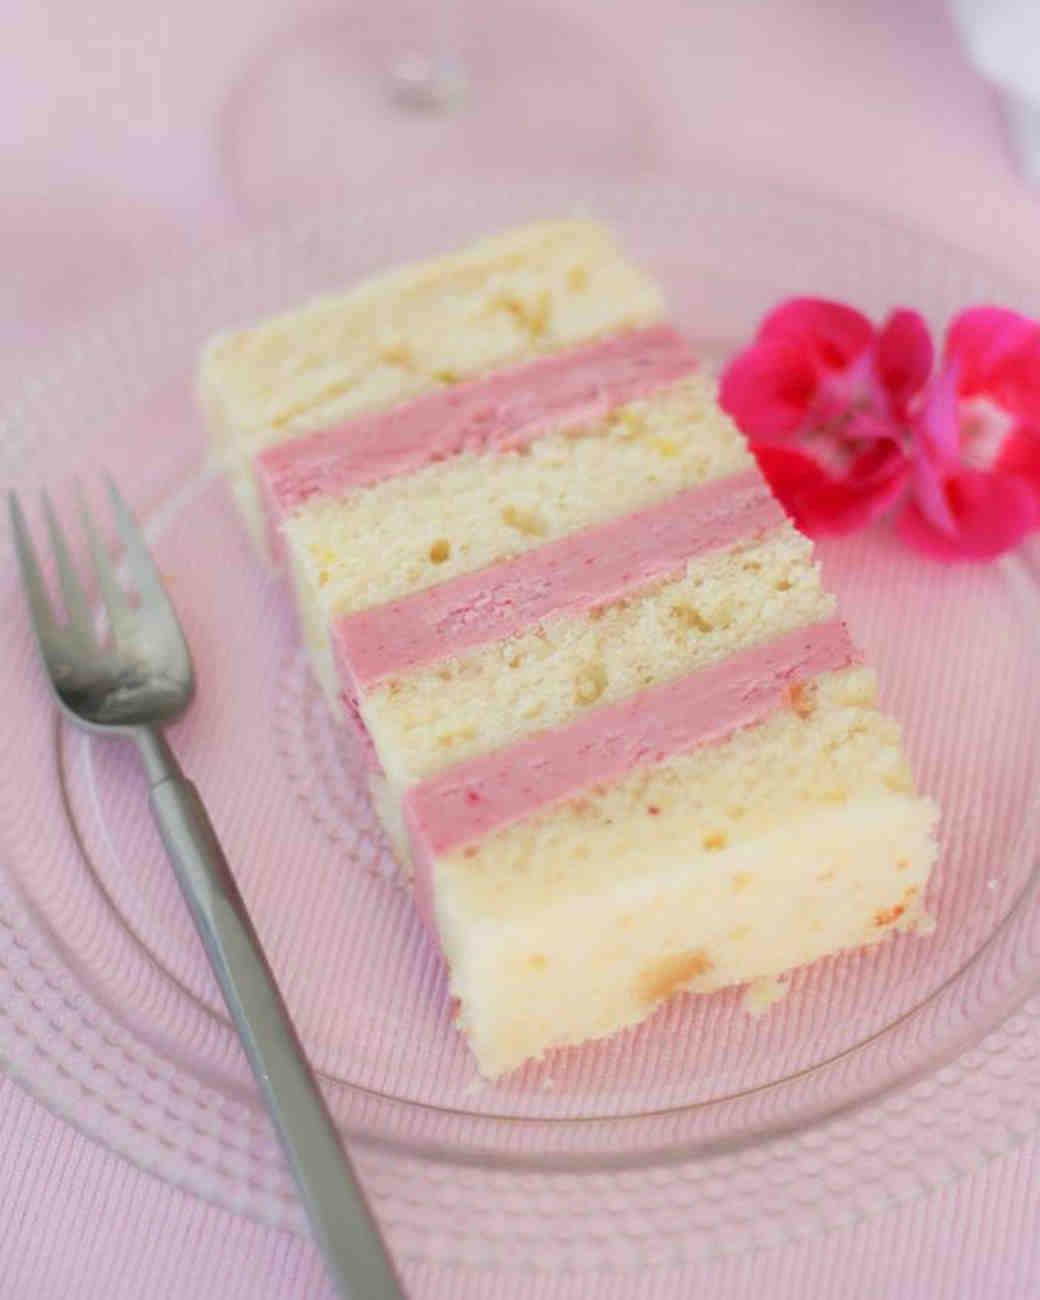 creative-cake-flavors-lemon-verbena-zested-cake-0116.jpg